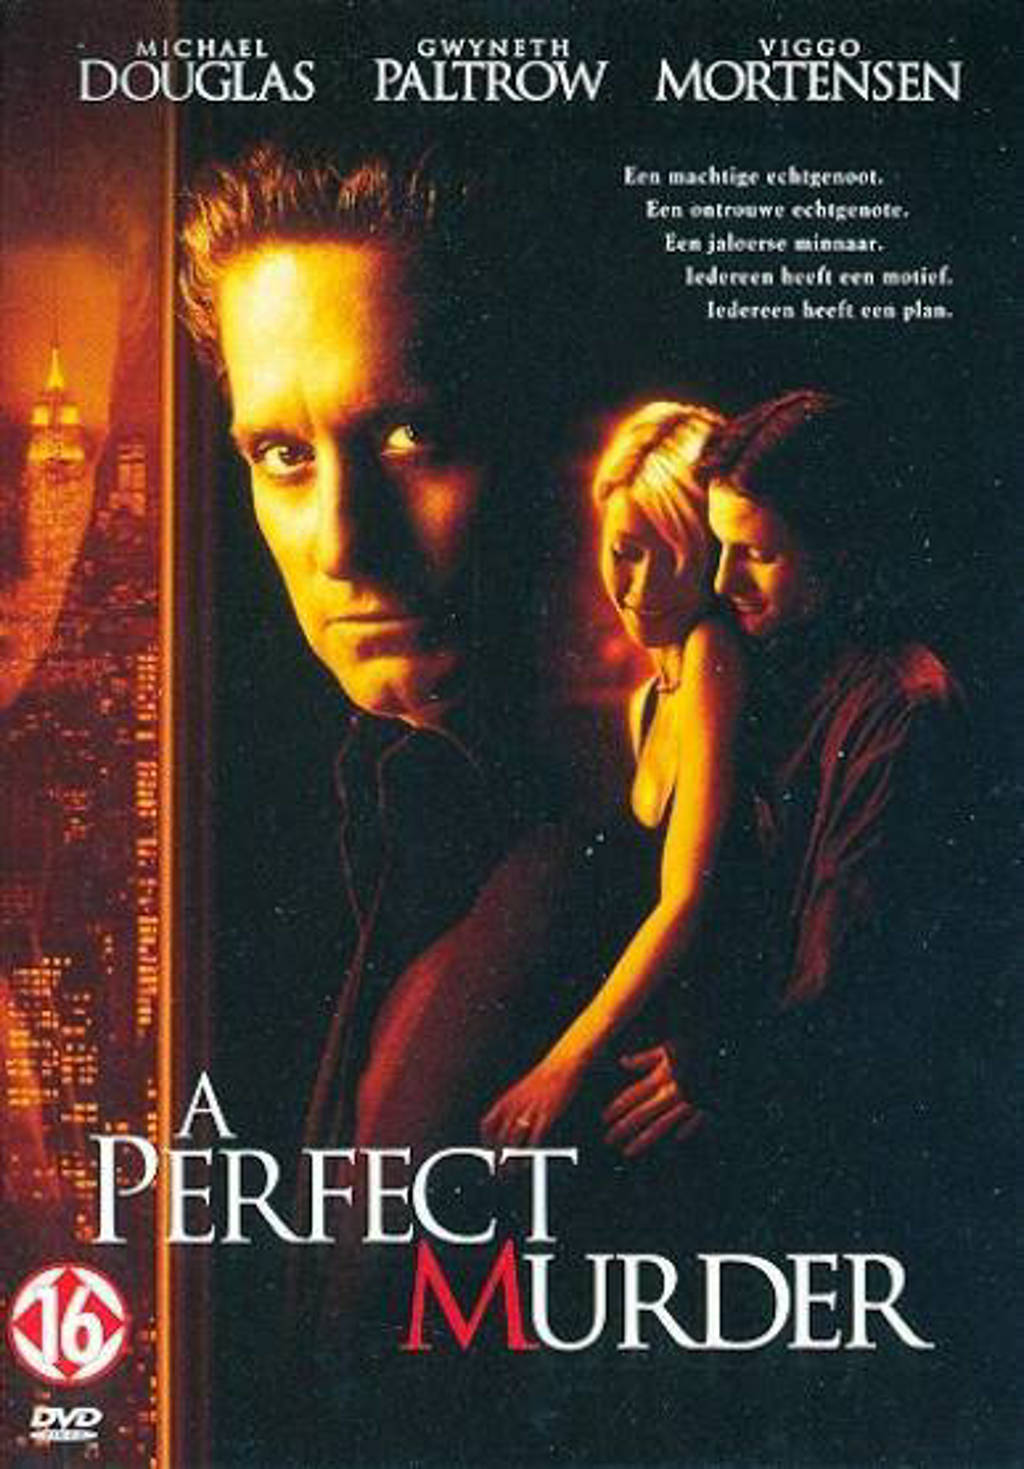 Perfect murder (DVD)